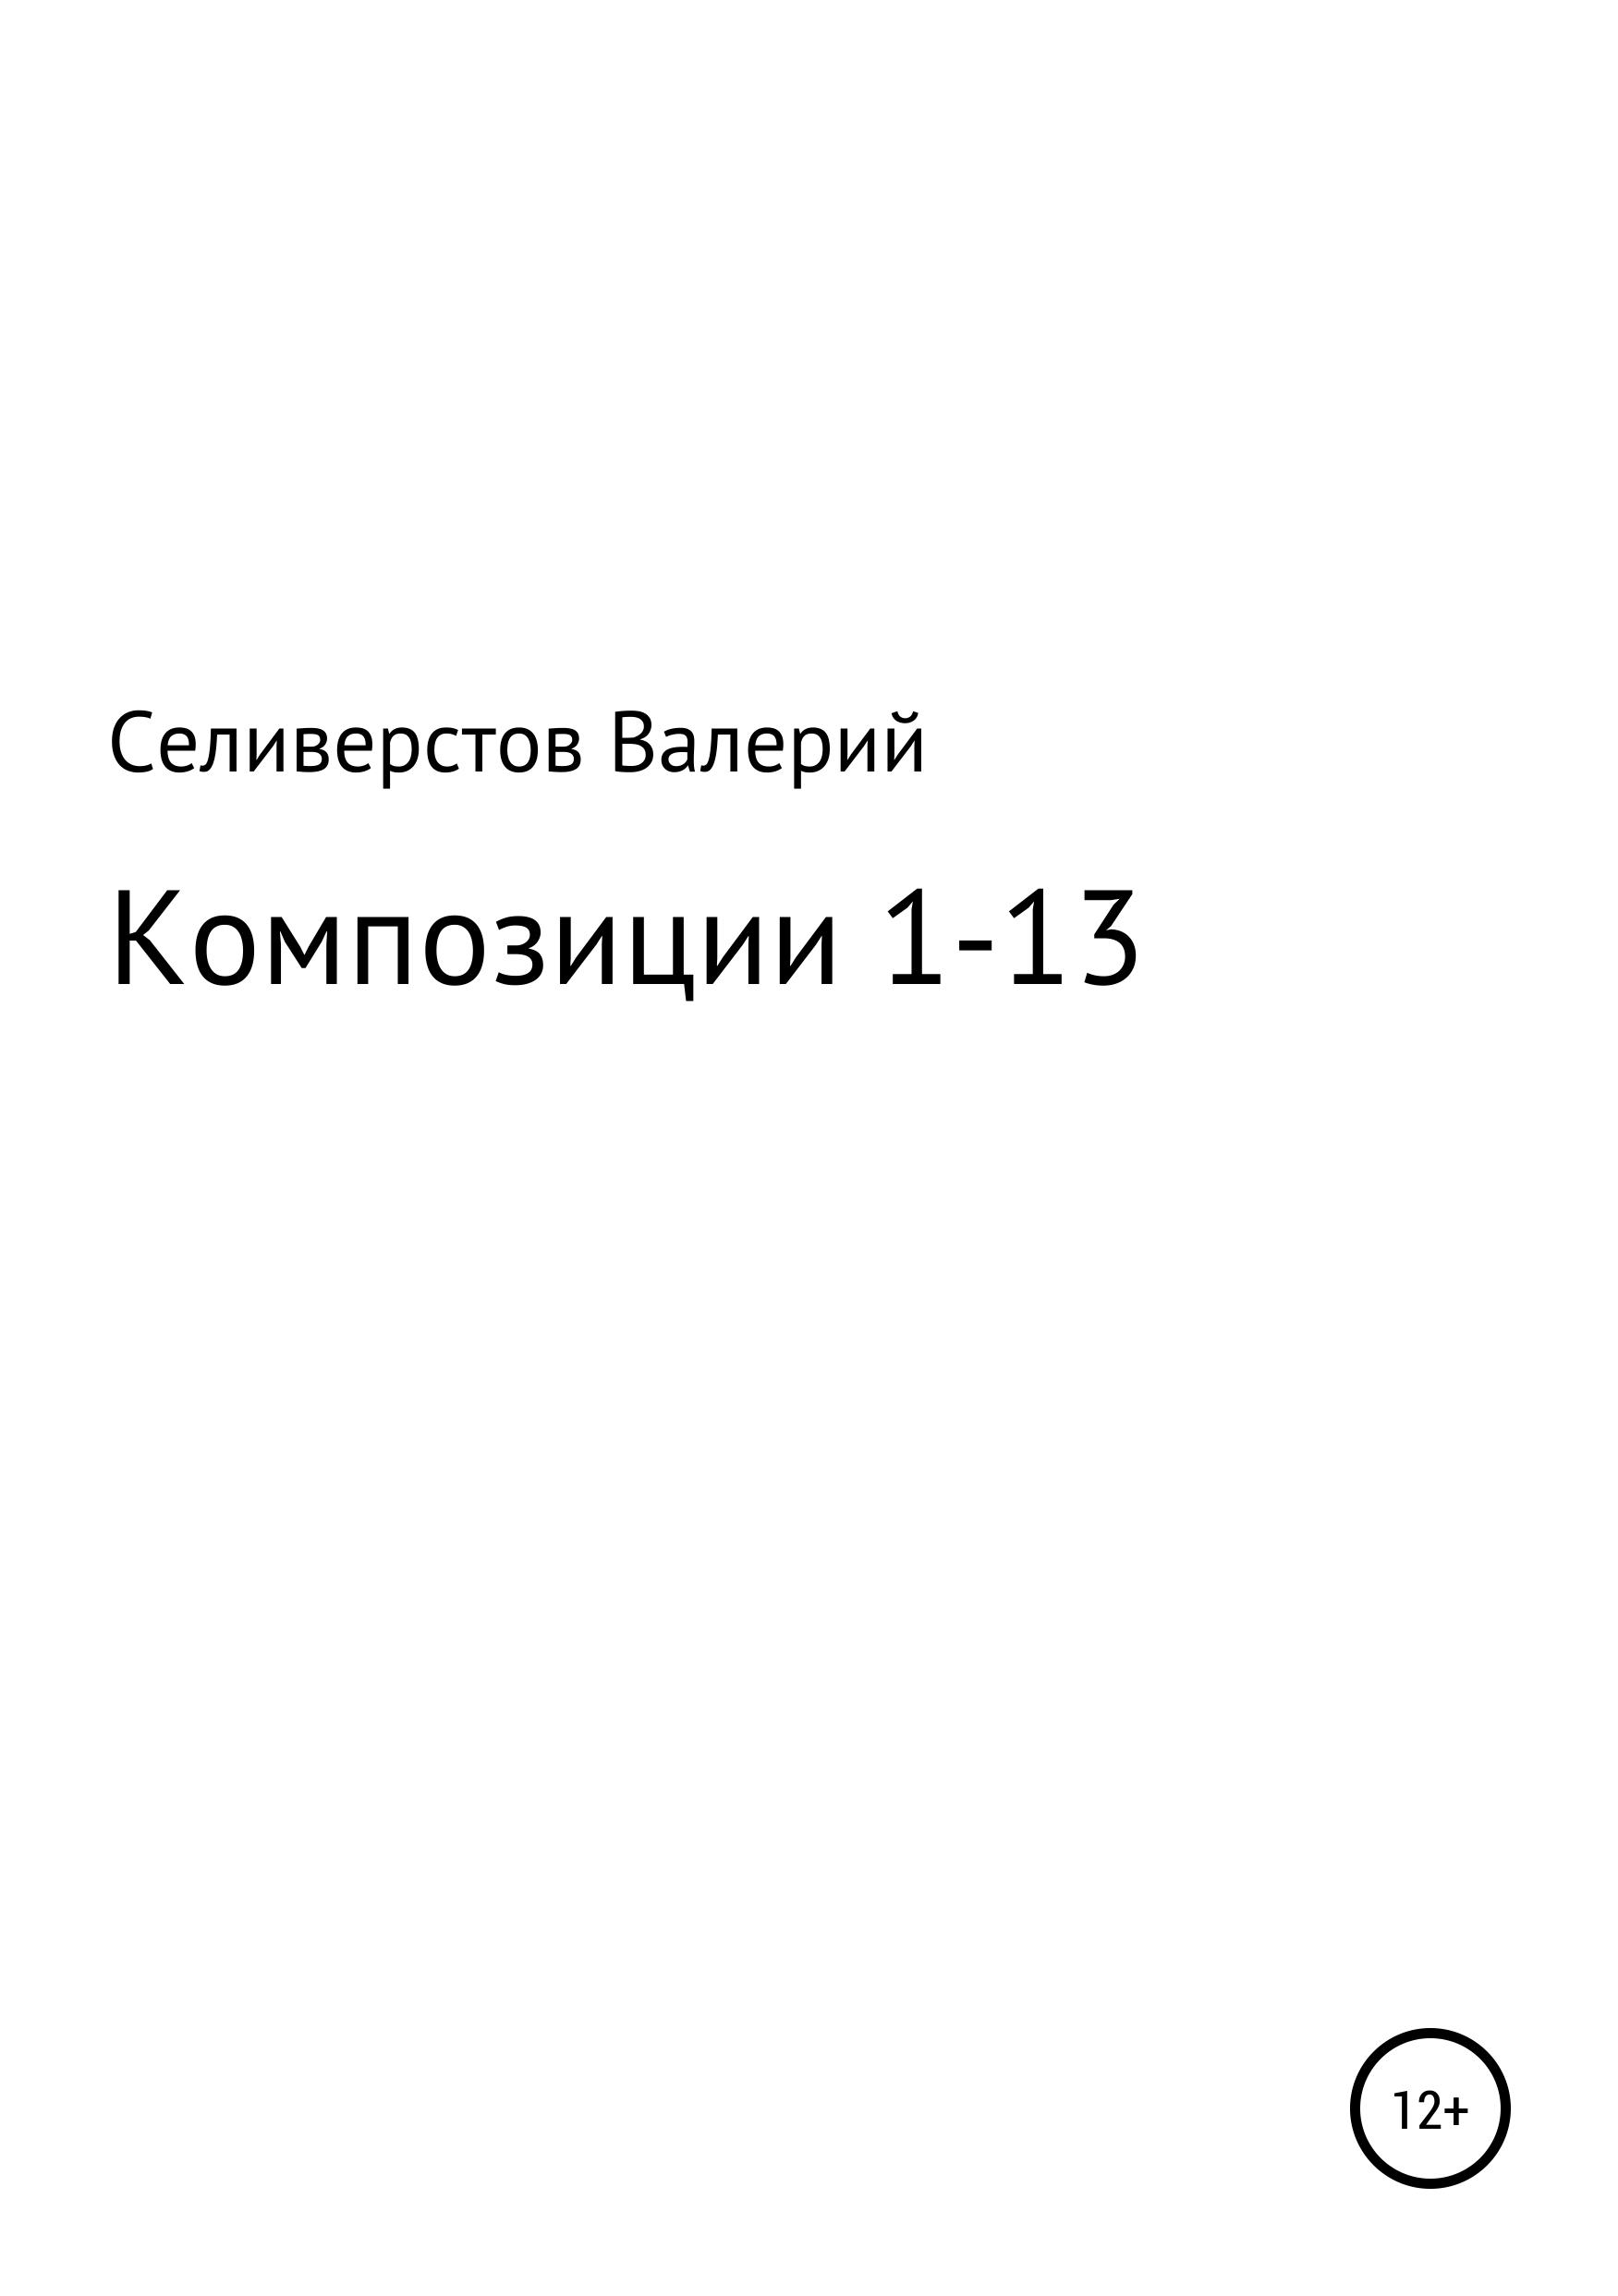 Композиции 1-13